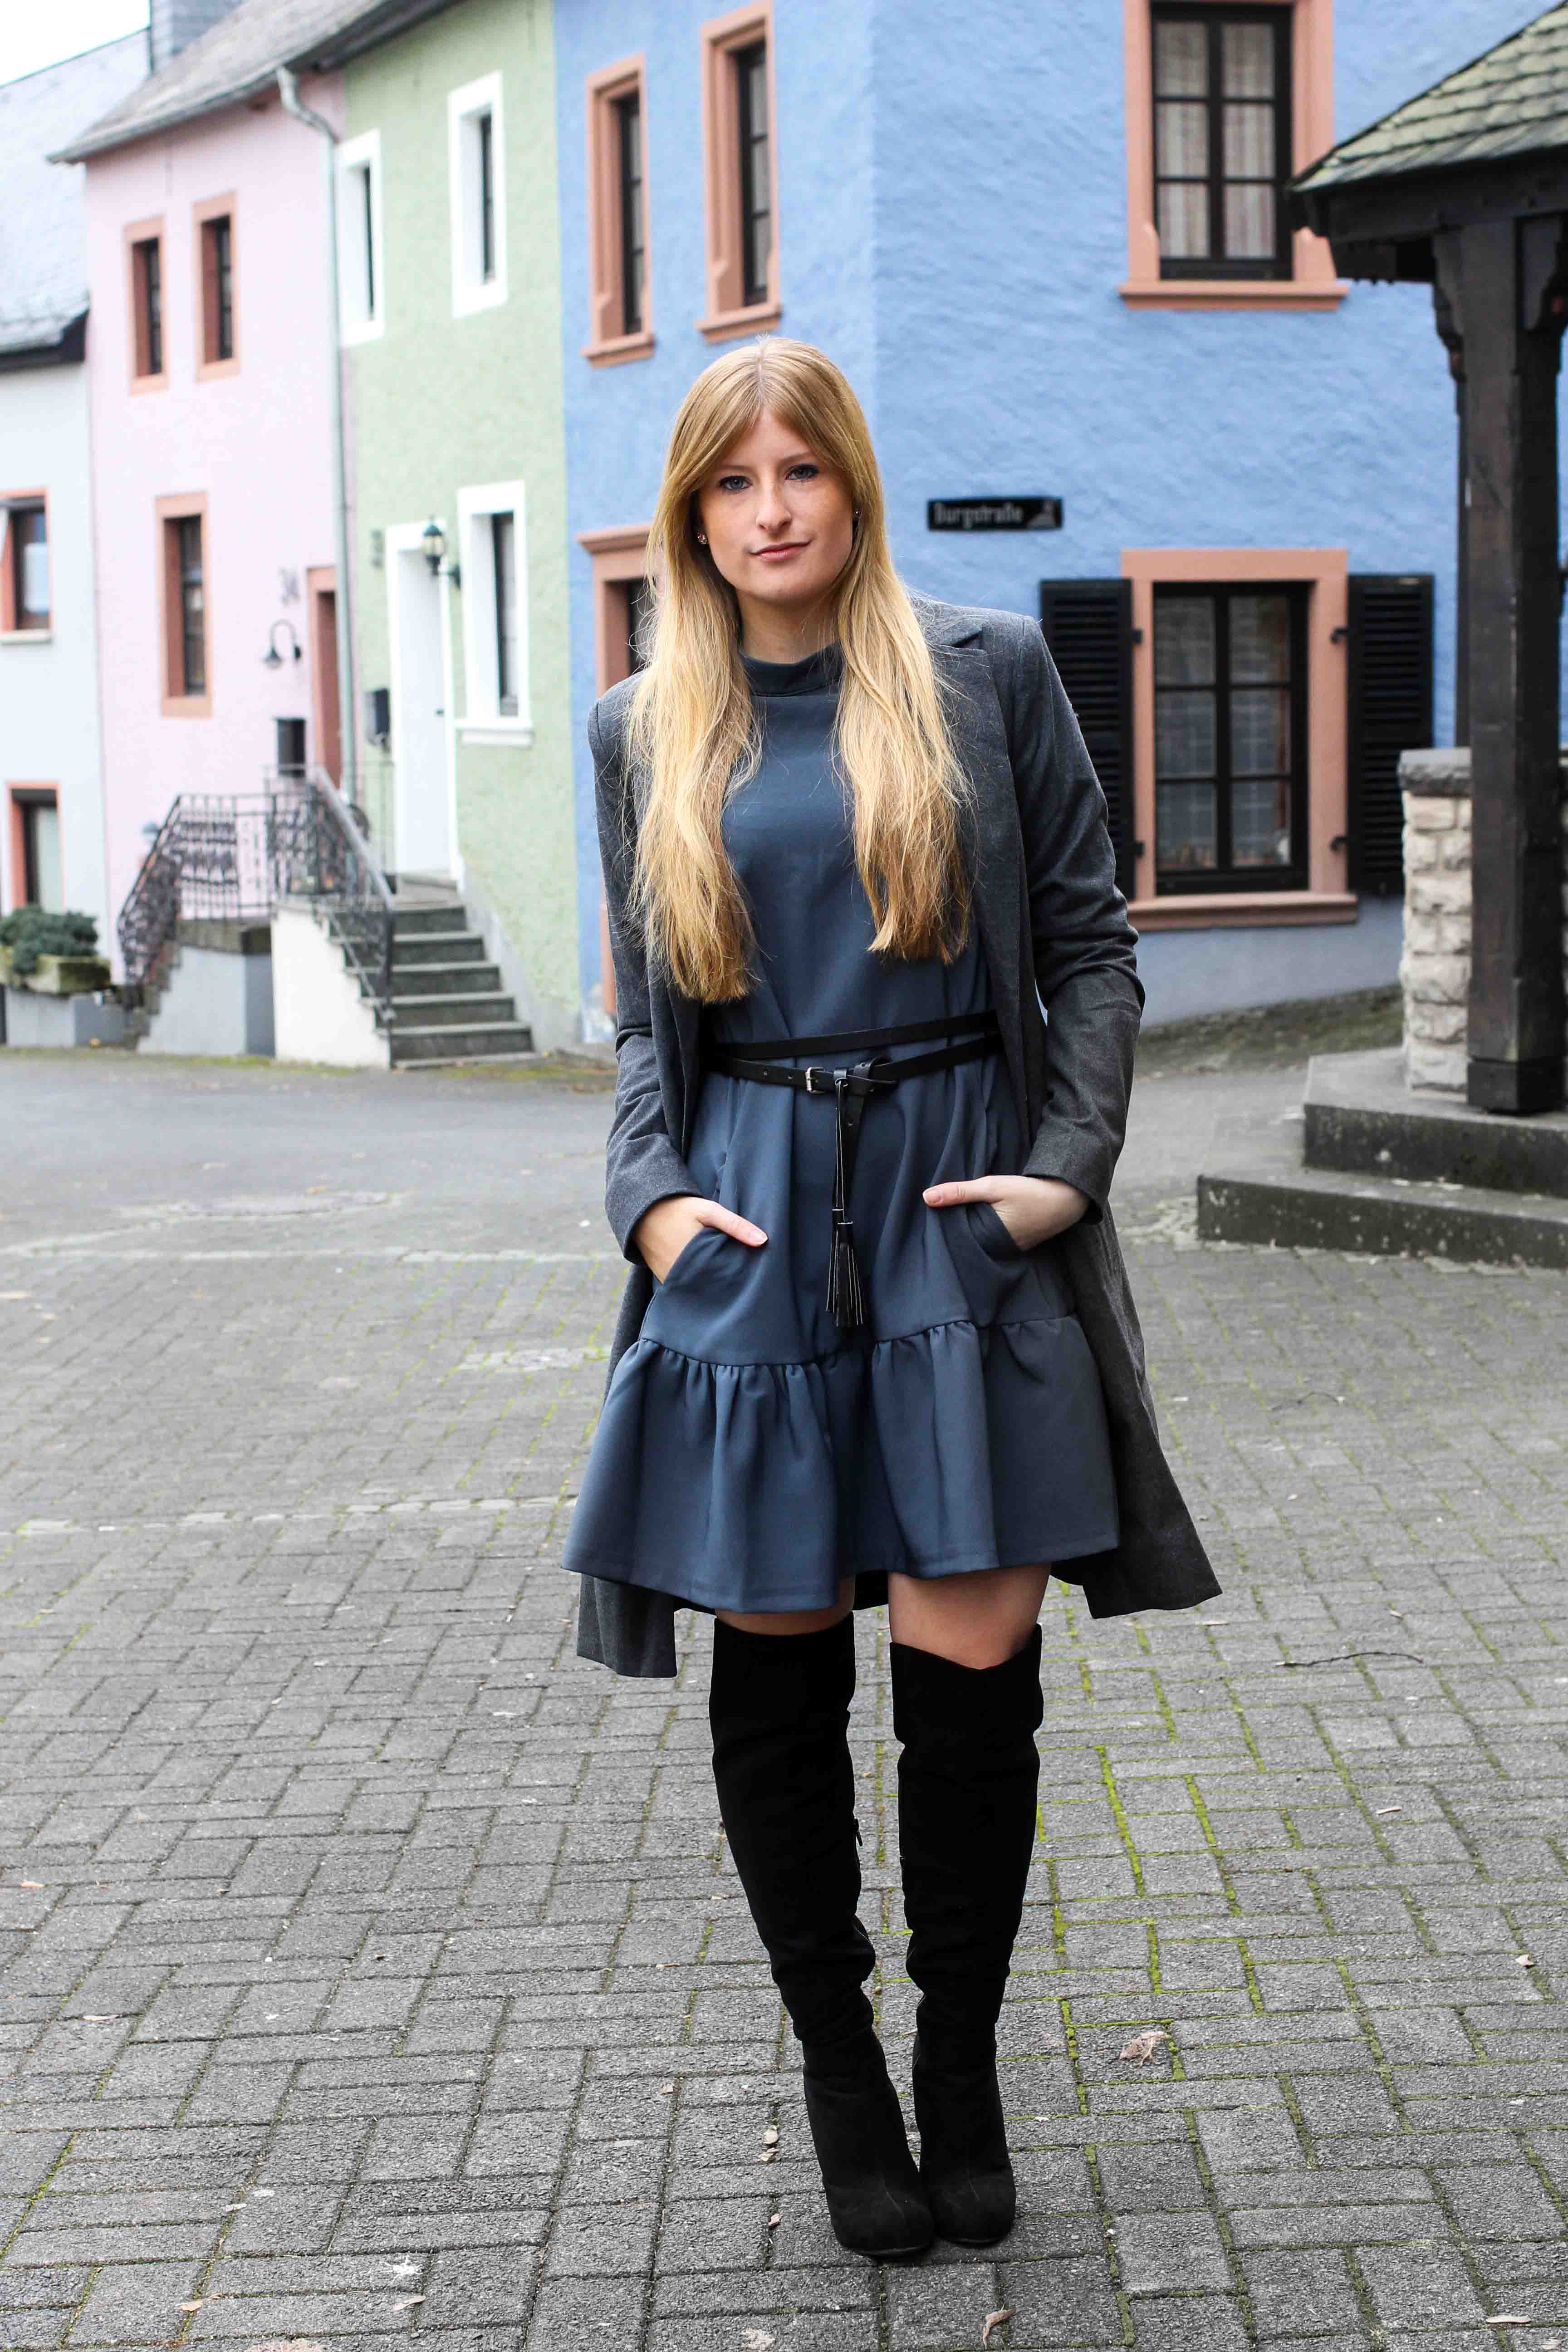 Blaues Winterkleid Closet London schwarze Overknees grauer Mantel Winter Outfit Modeblog 4